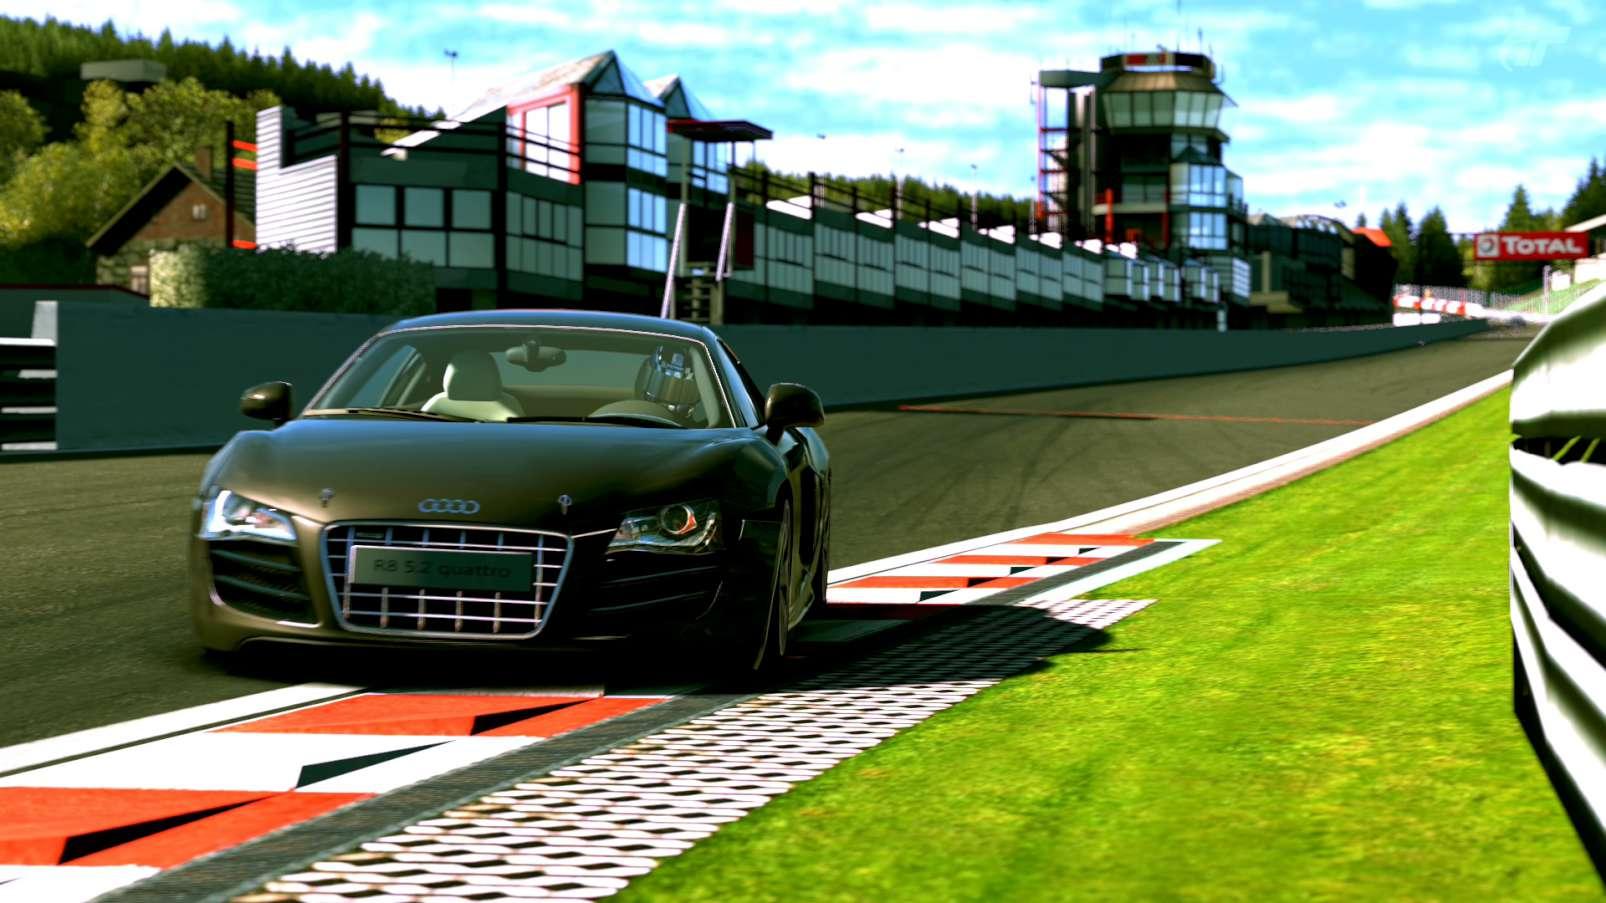 Circuit at Spa Francorchamps